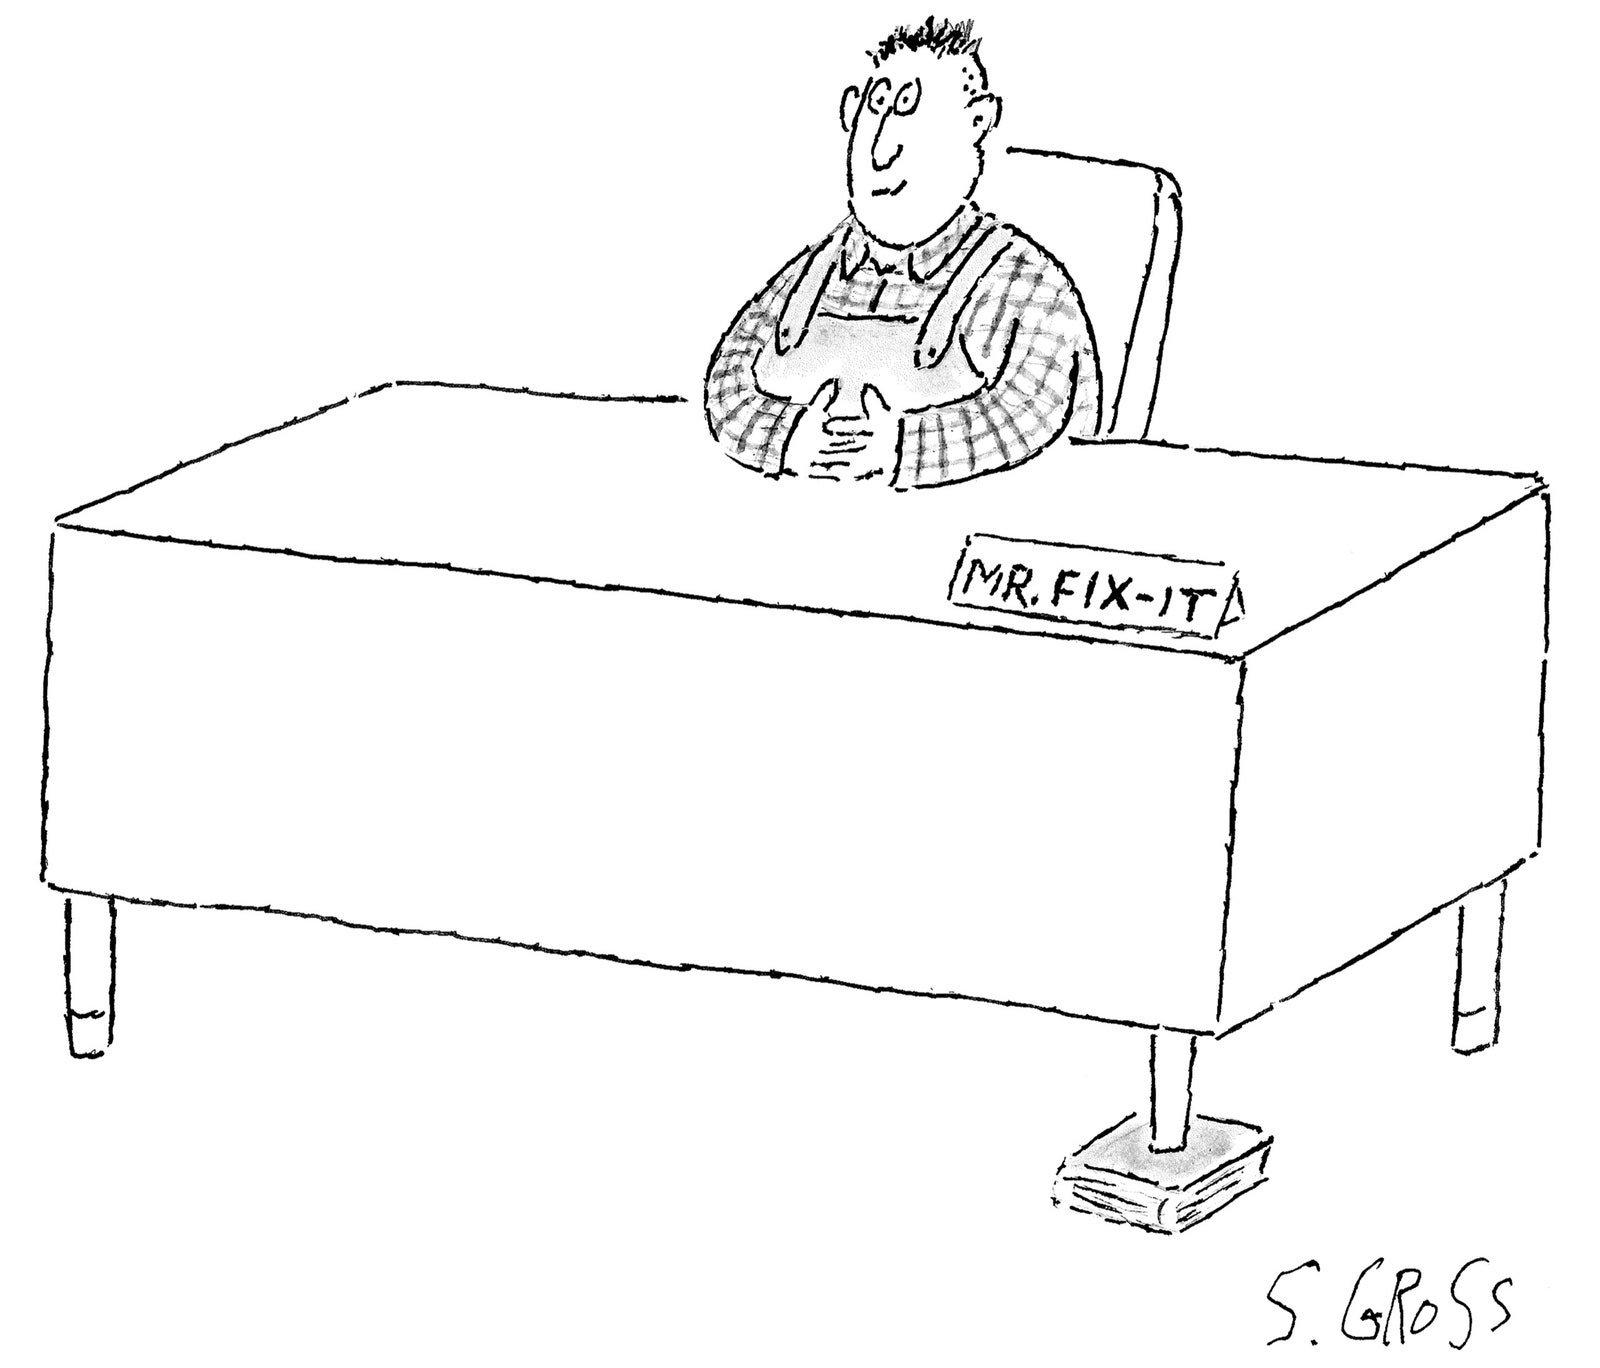 Cartoon by Sam Gross